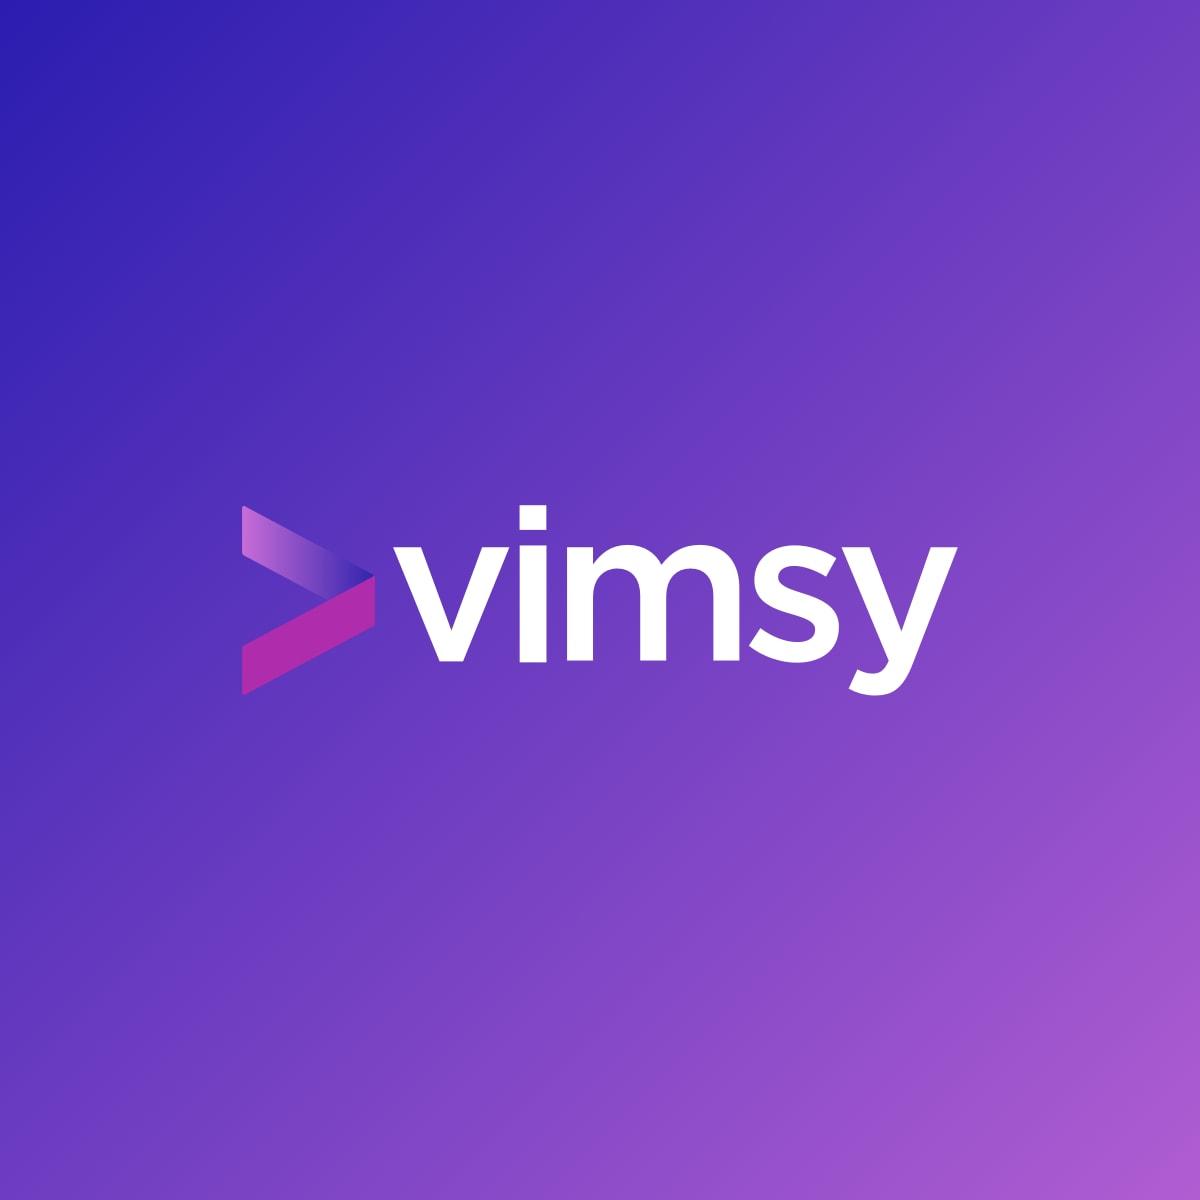 Vimsy